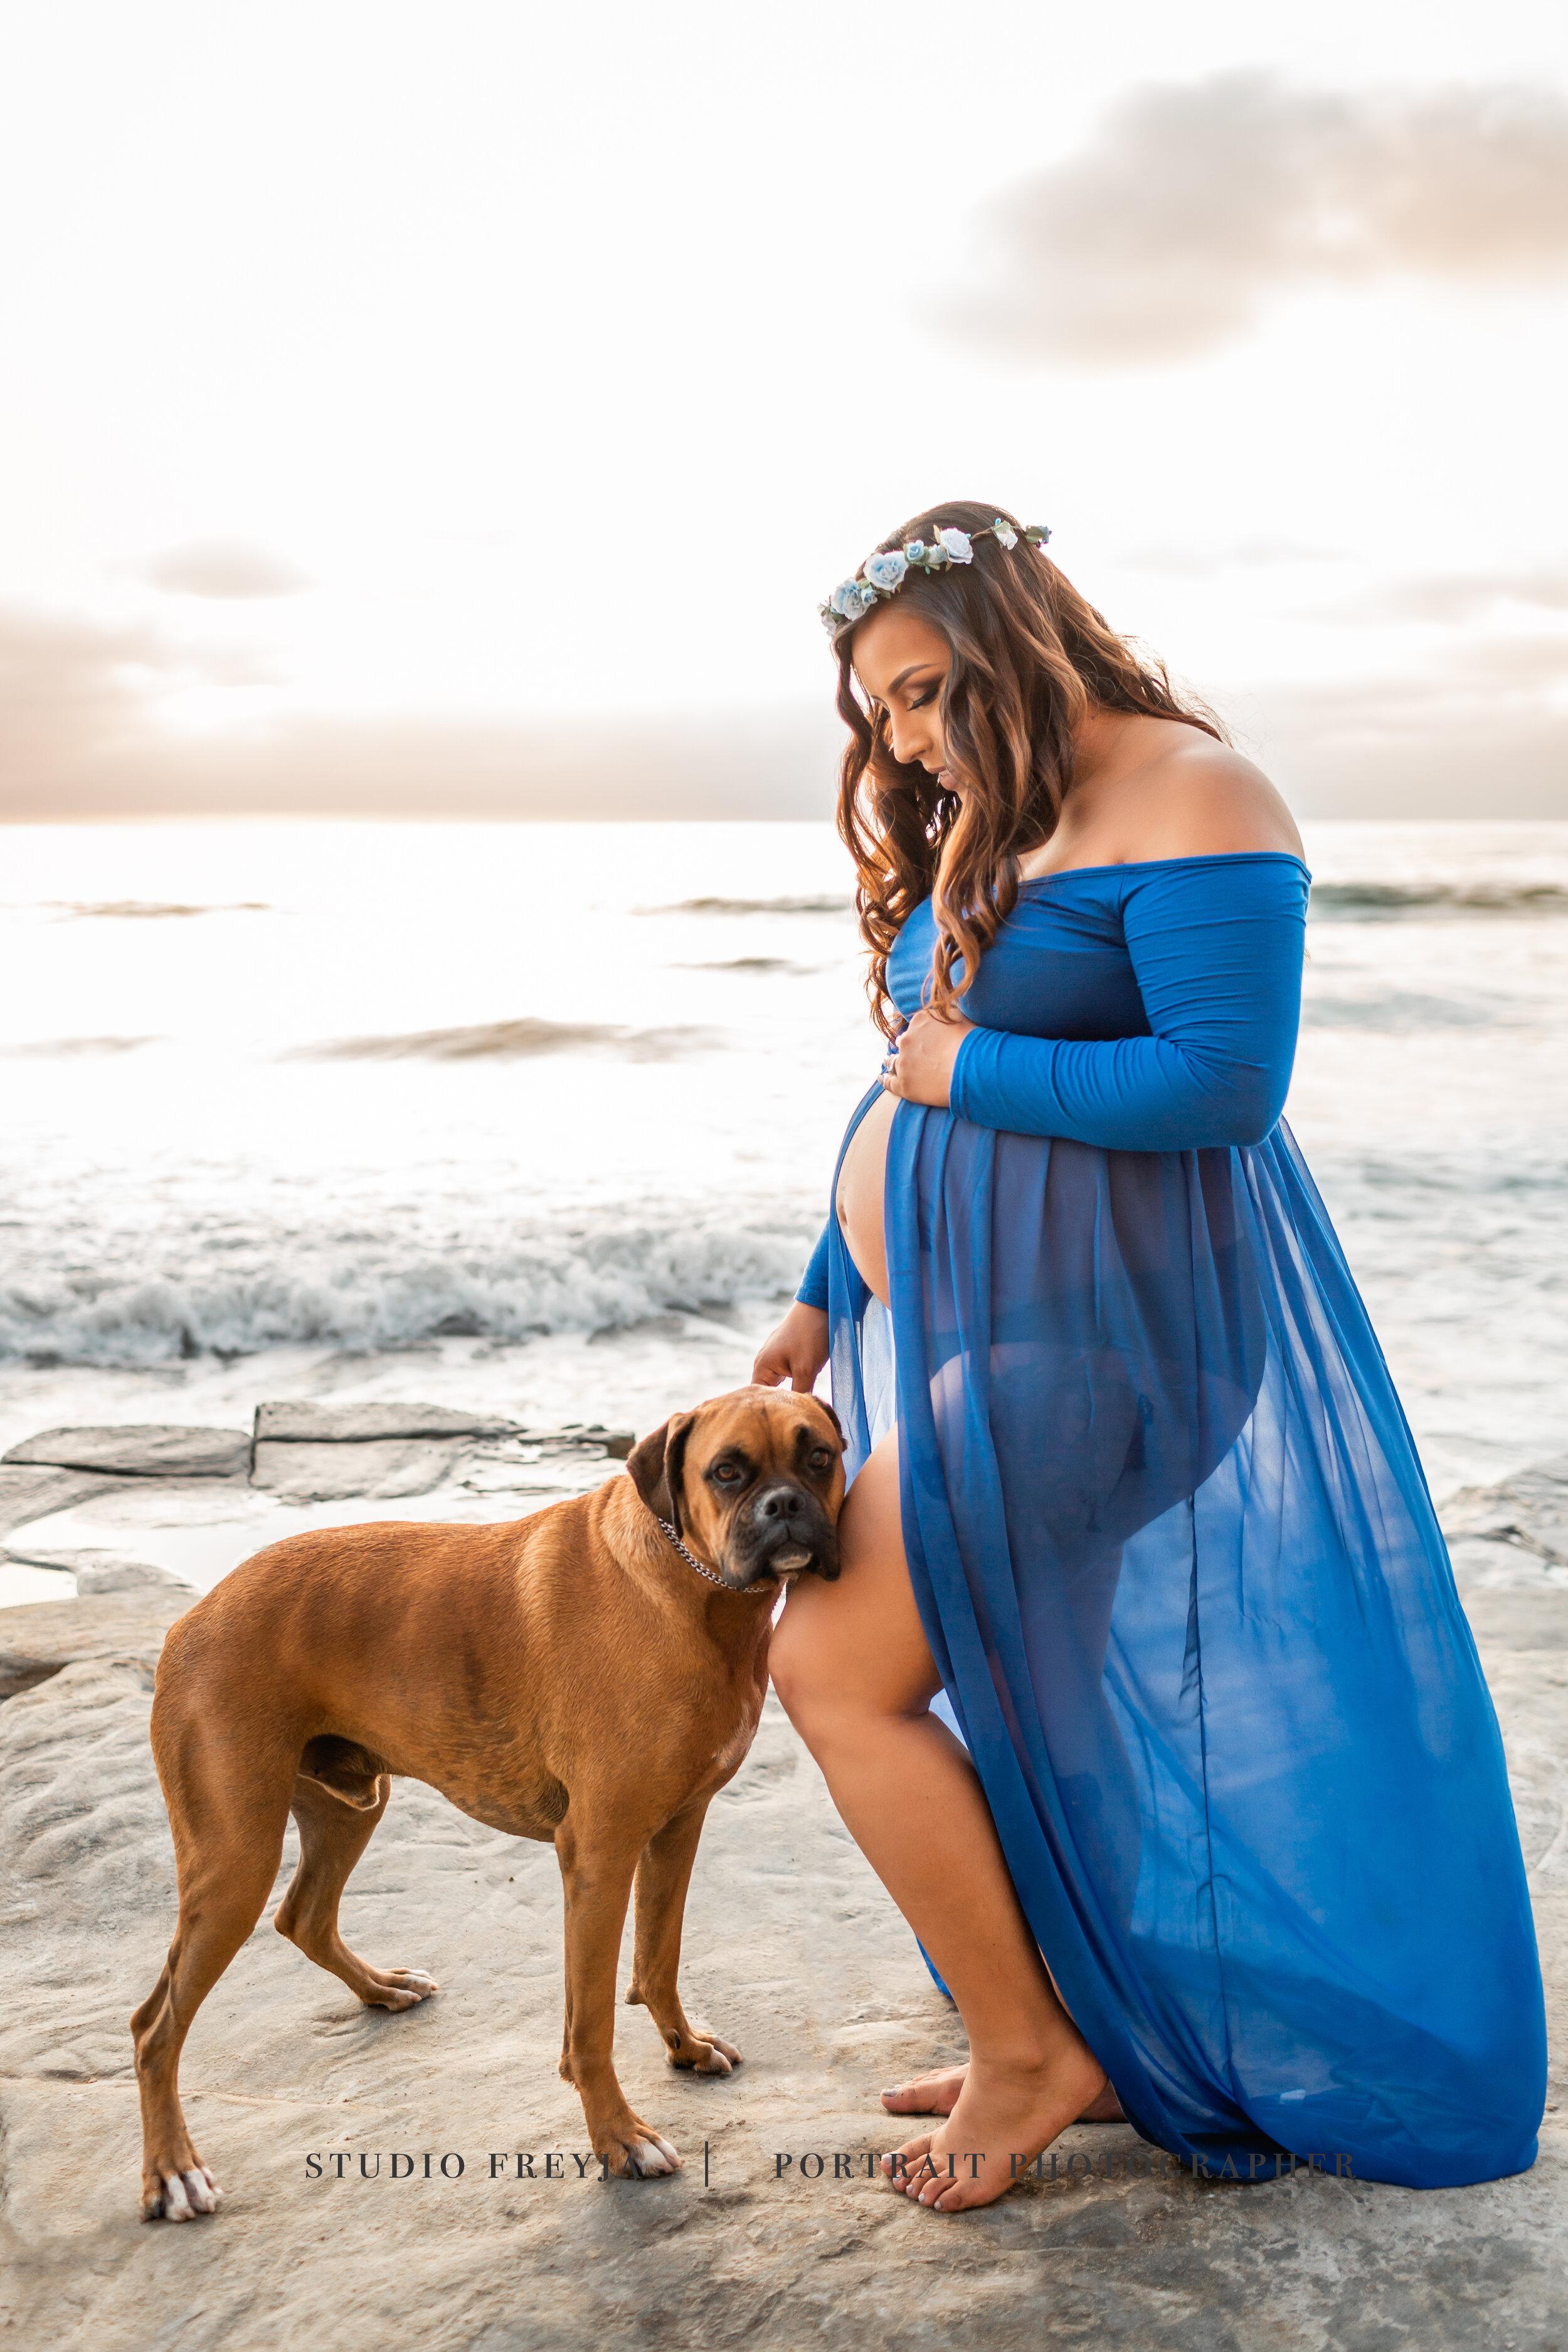 Studio Freyj, San Diego Maternity Photographer